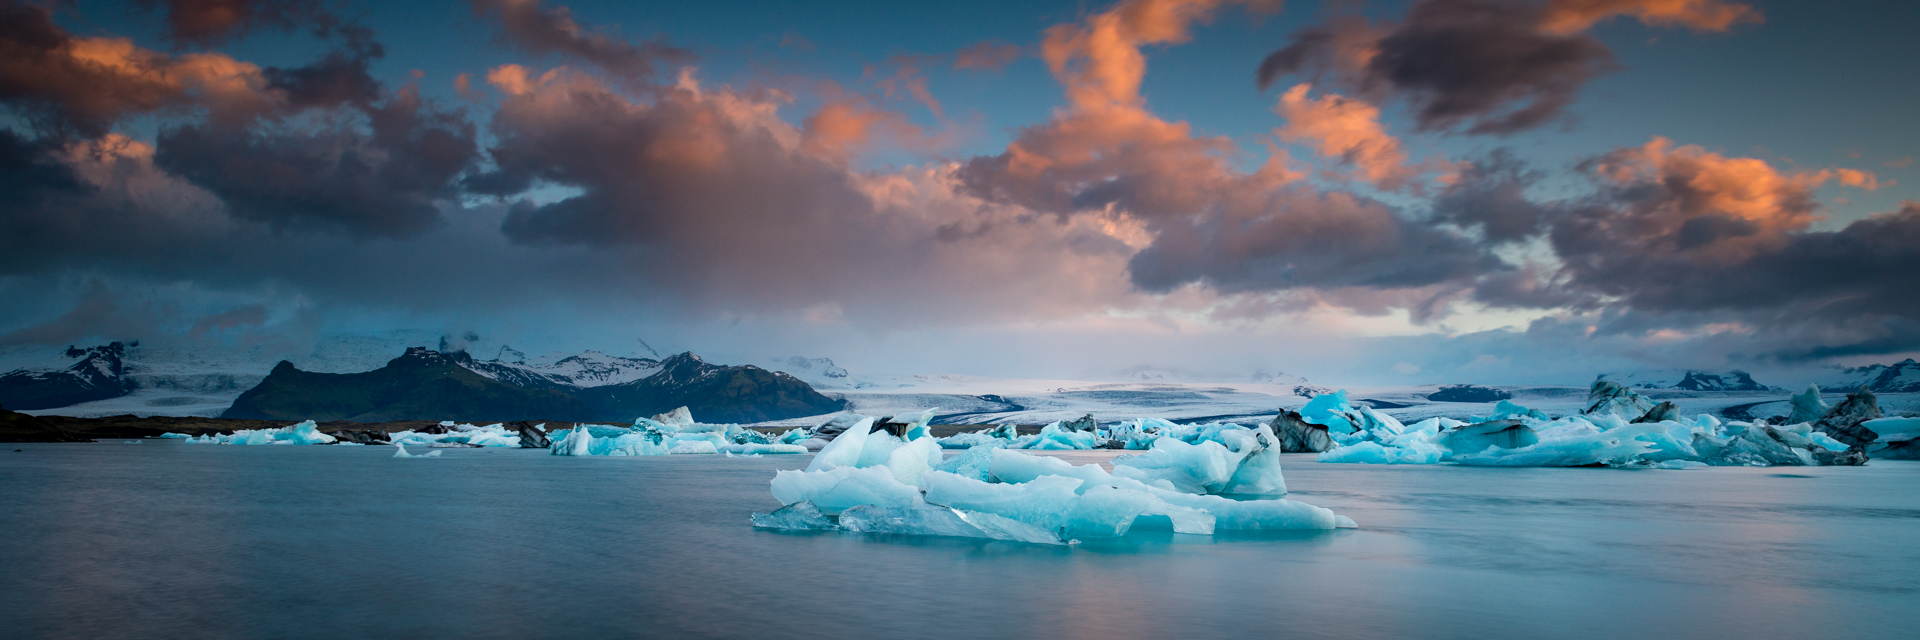 Iceberg_4a.jpg